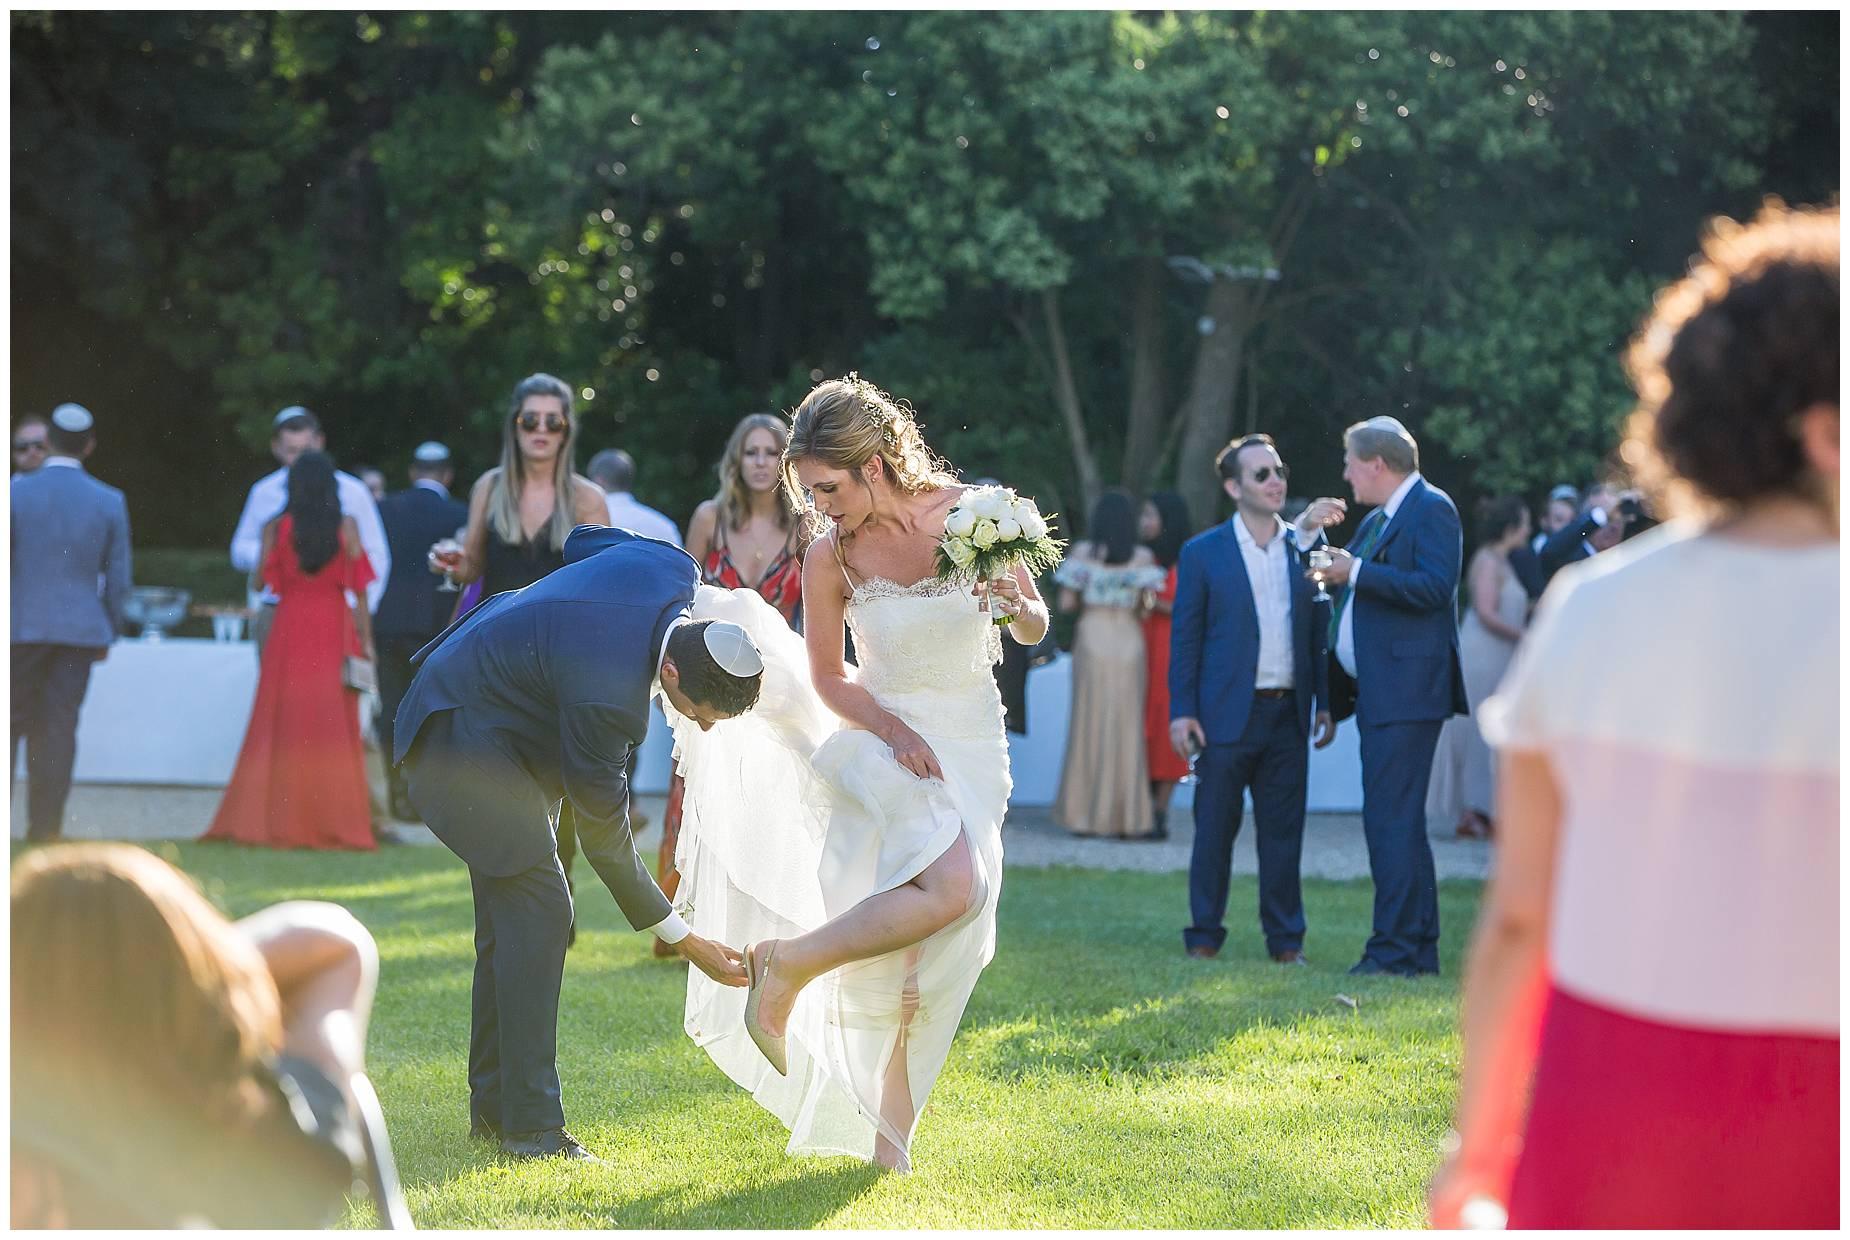 bride gets stuck in grass